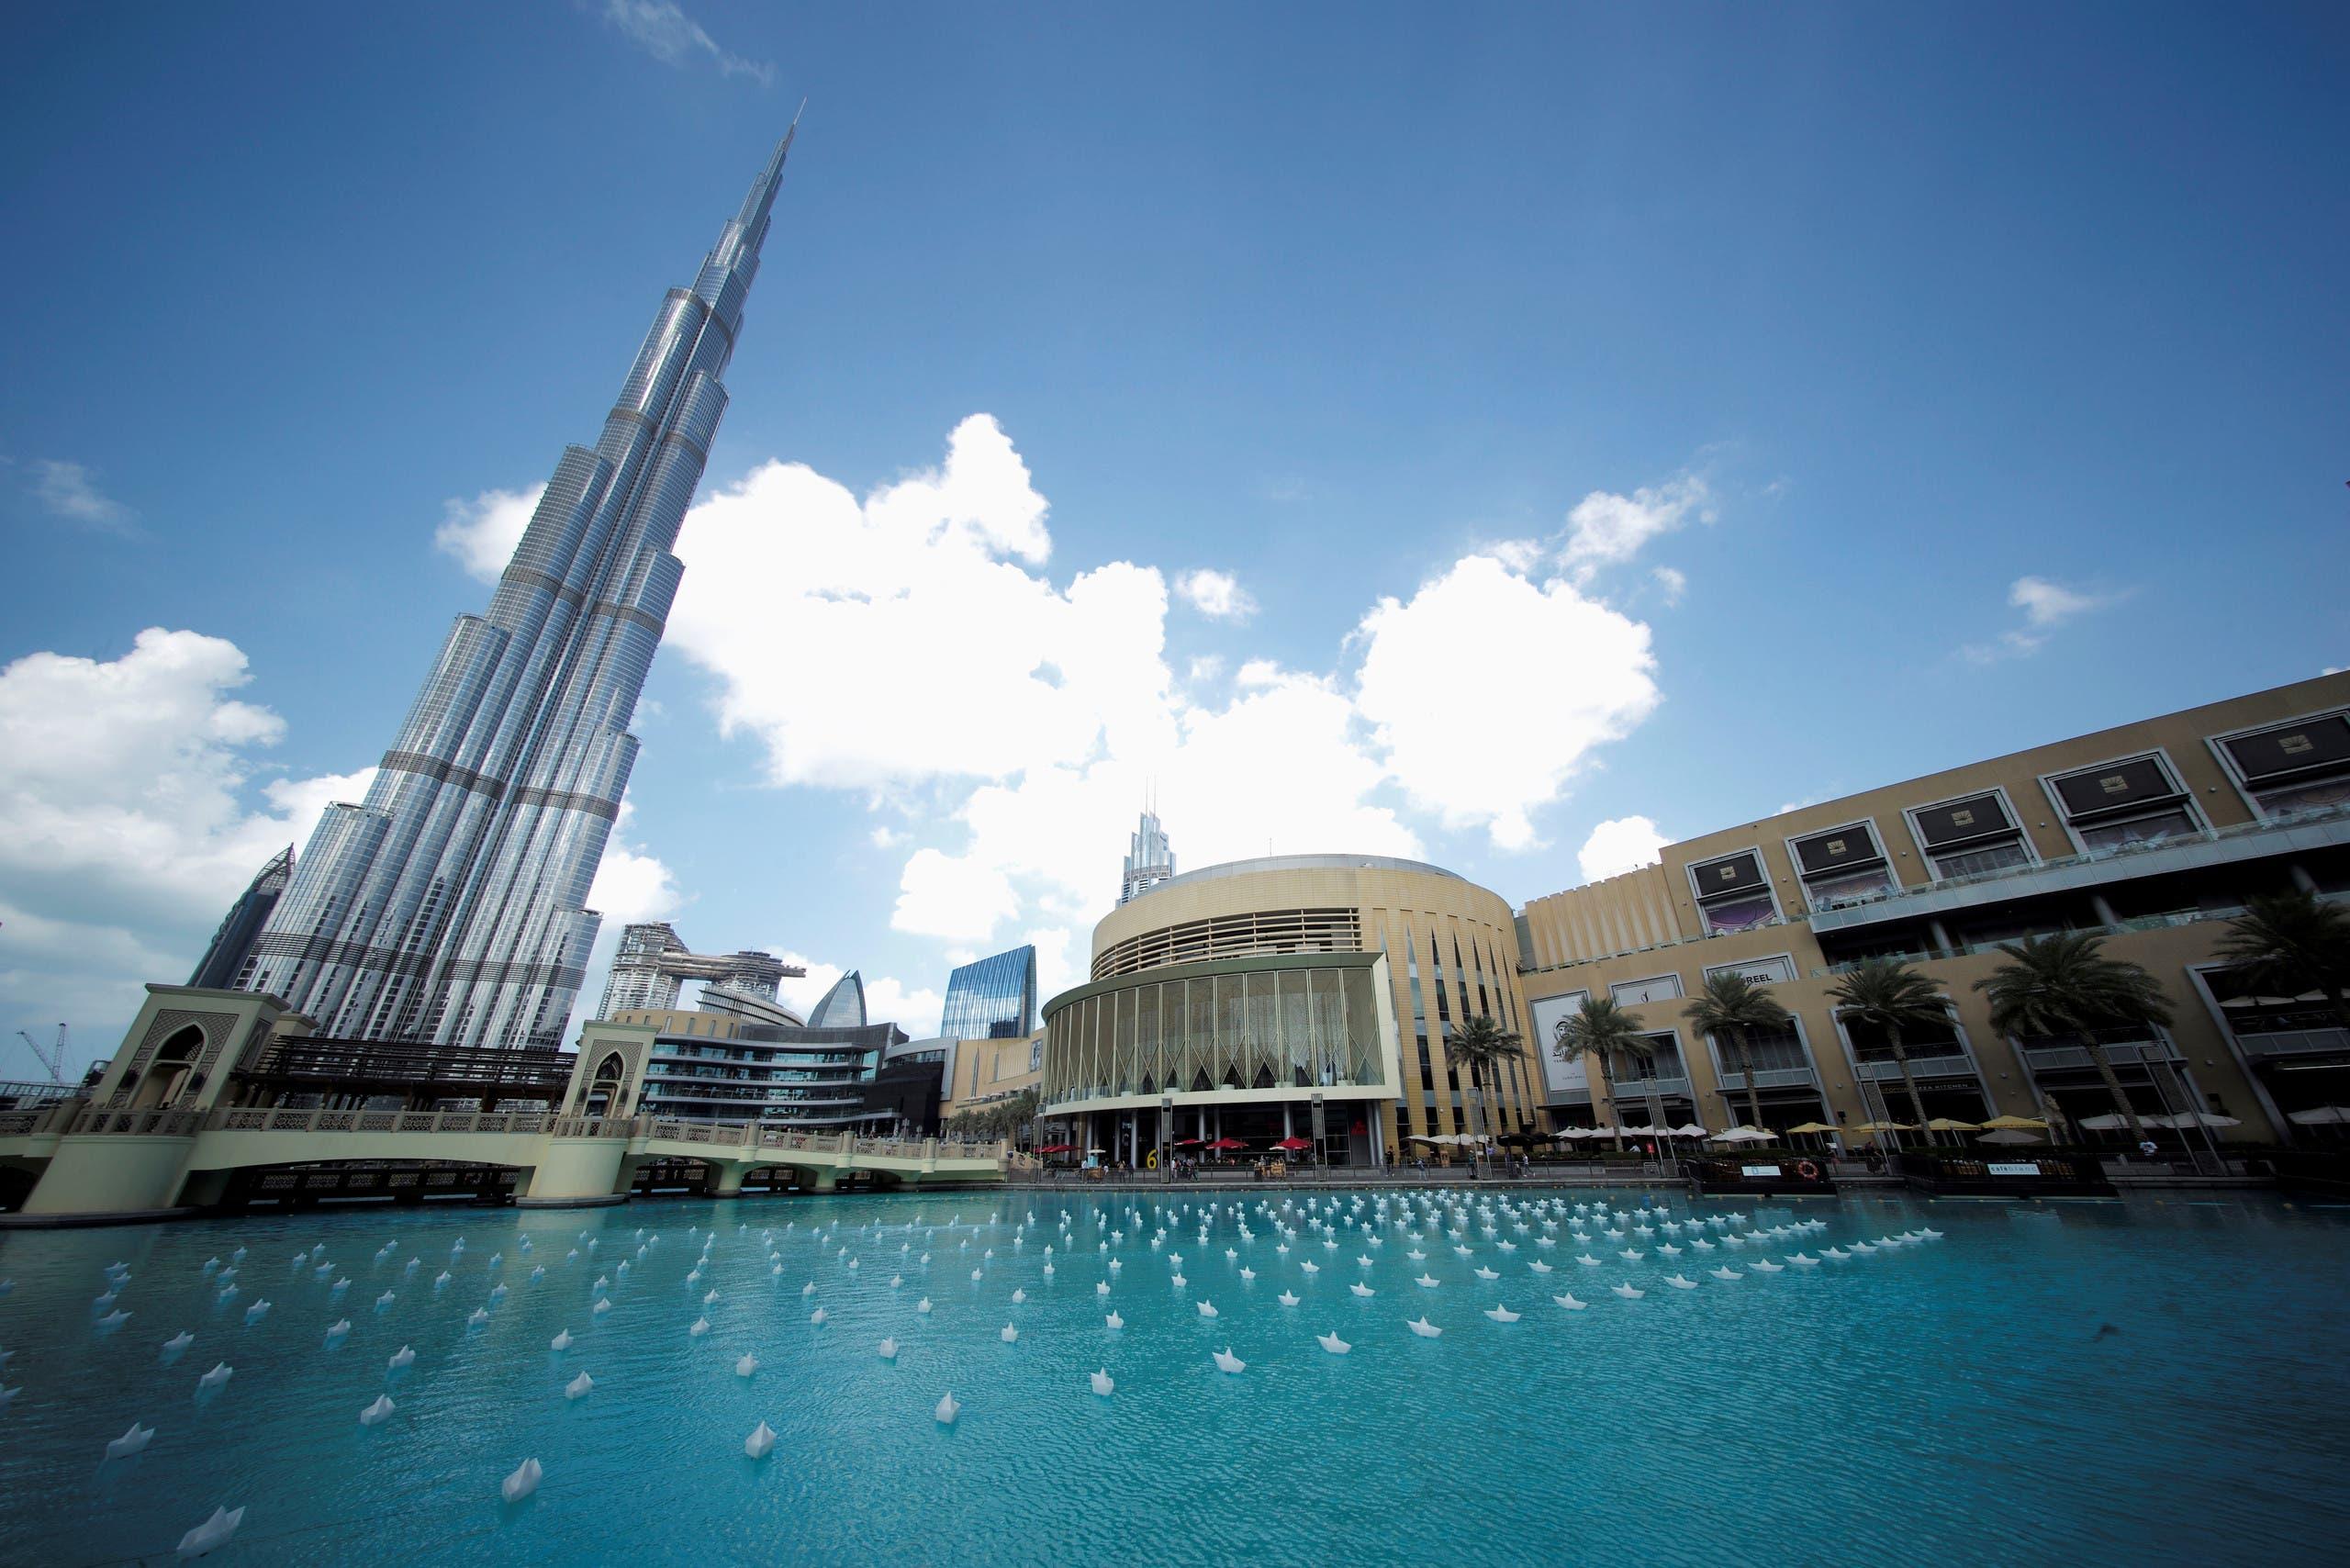 General view of the world's tallest building Burj Khalifa and Dubai Mall in Dubai, United Arab Emirates, November 21, 2018. (Reuters)